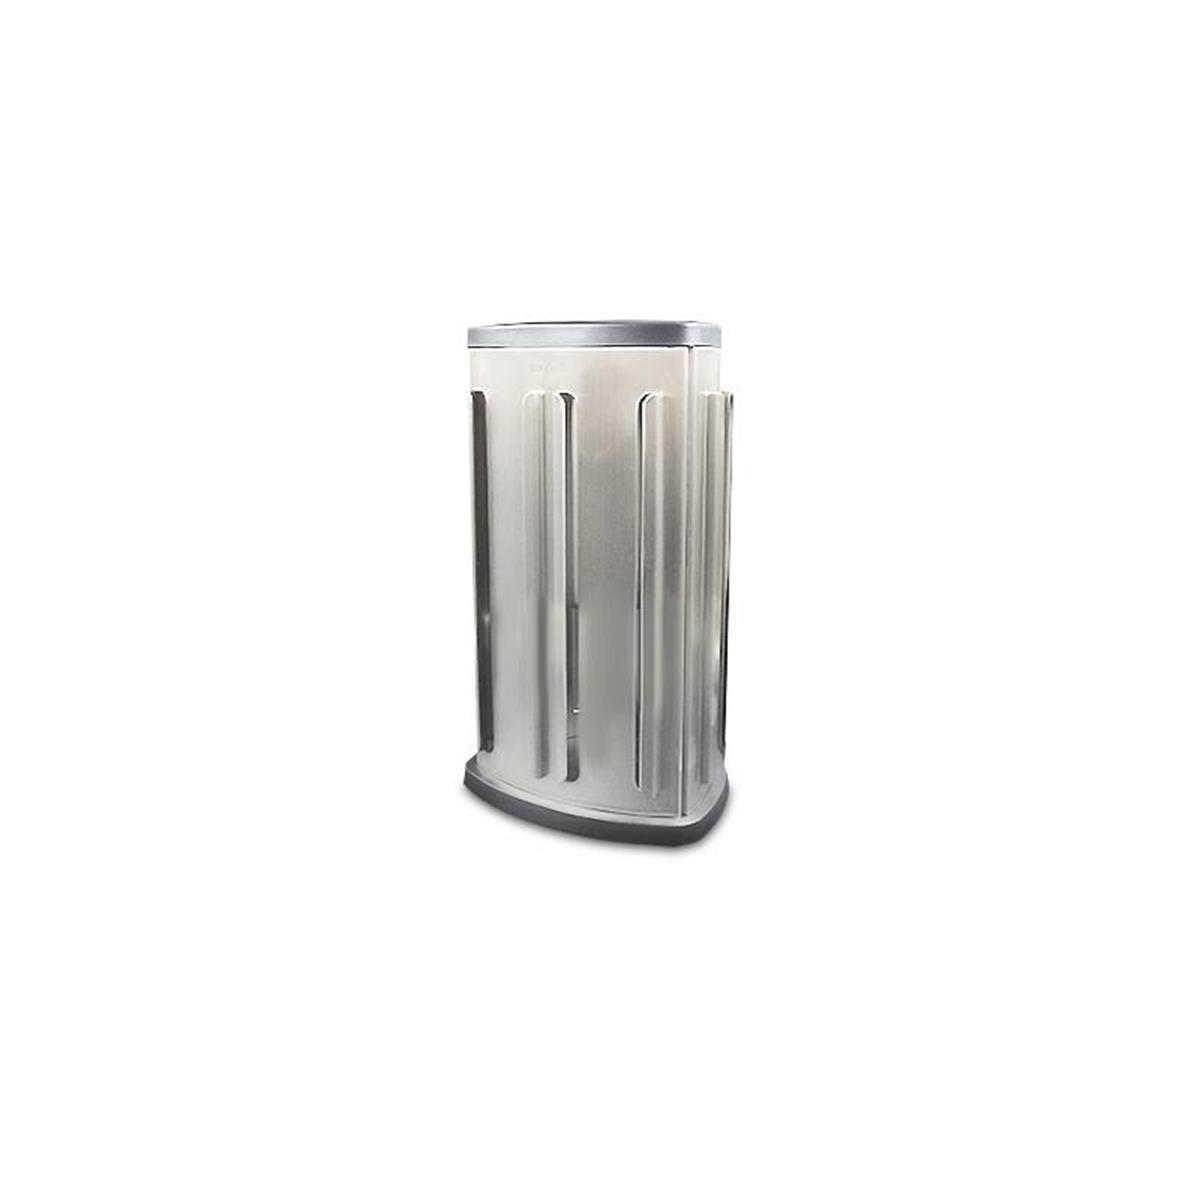 brabantia kapsel spender f r nespresso kapseln inkl. Black Bedroom Furniture Sets. Home Design Ideas